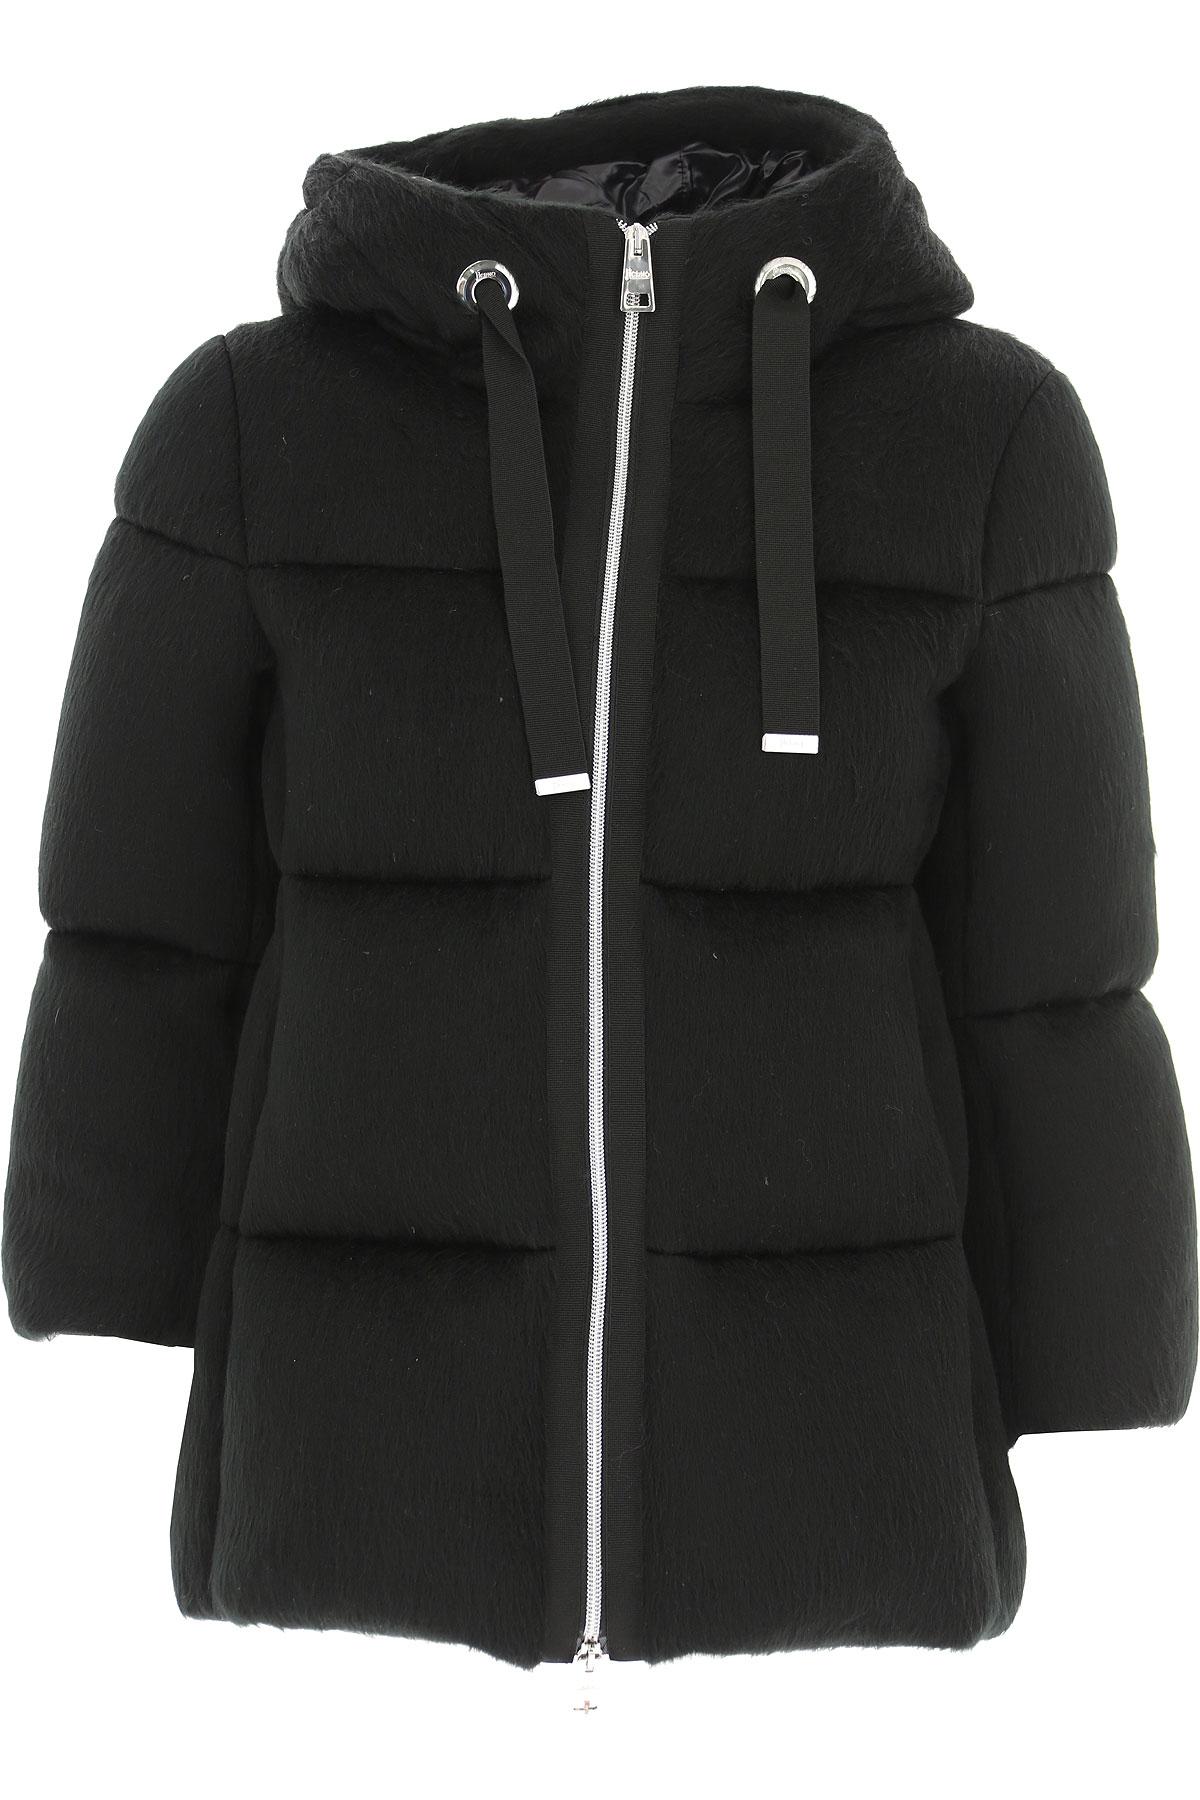 Herno Down Jacket for Women, Puffer Ski Jacket On Sale, Black, Acrylic, 2019, 10 4 6